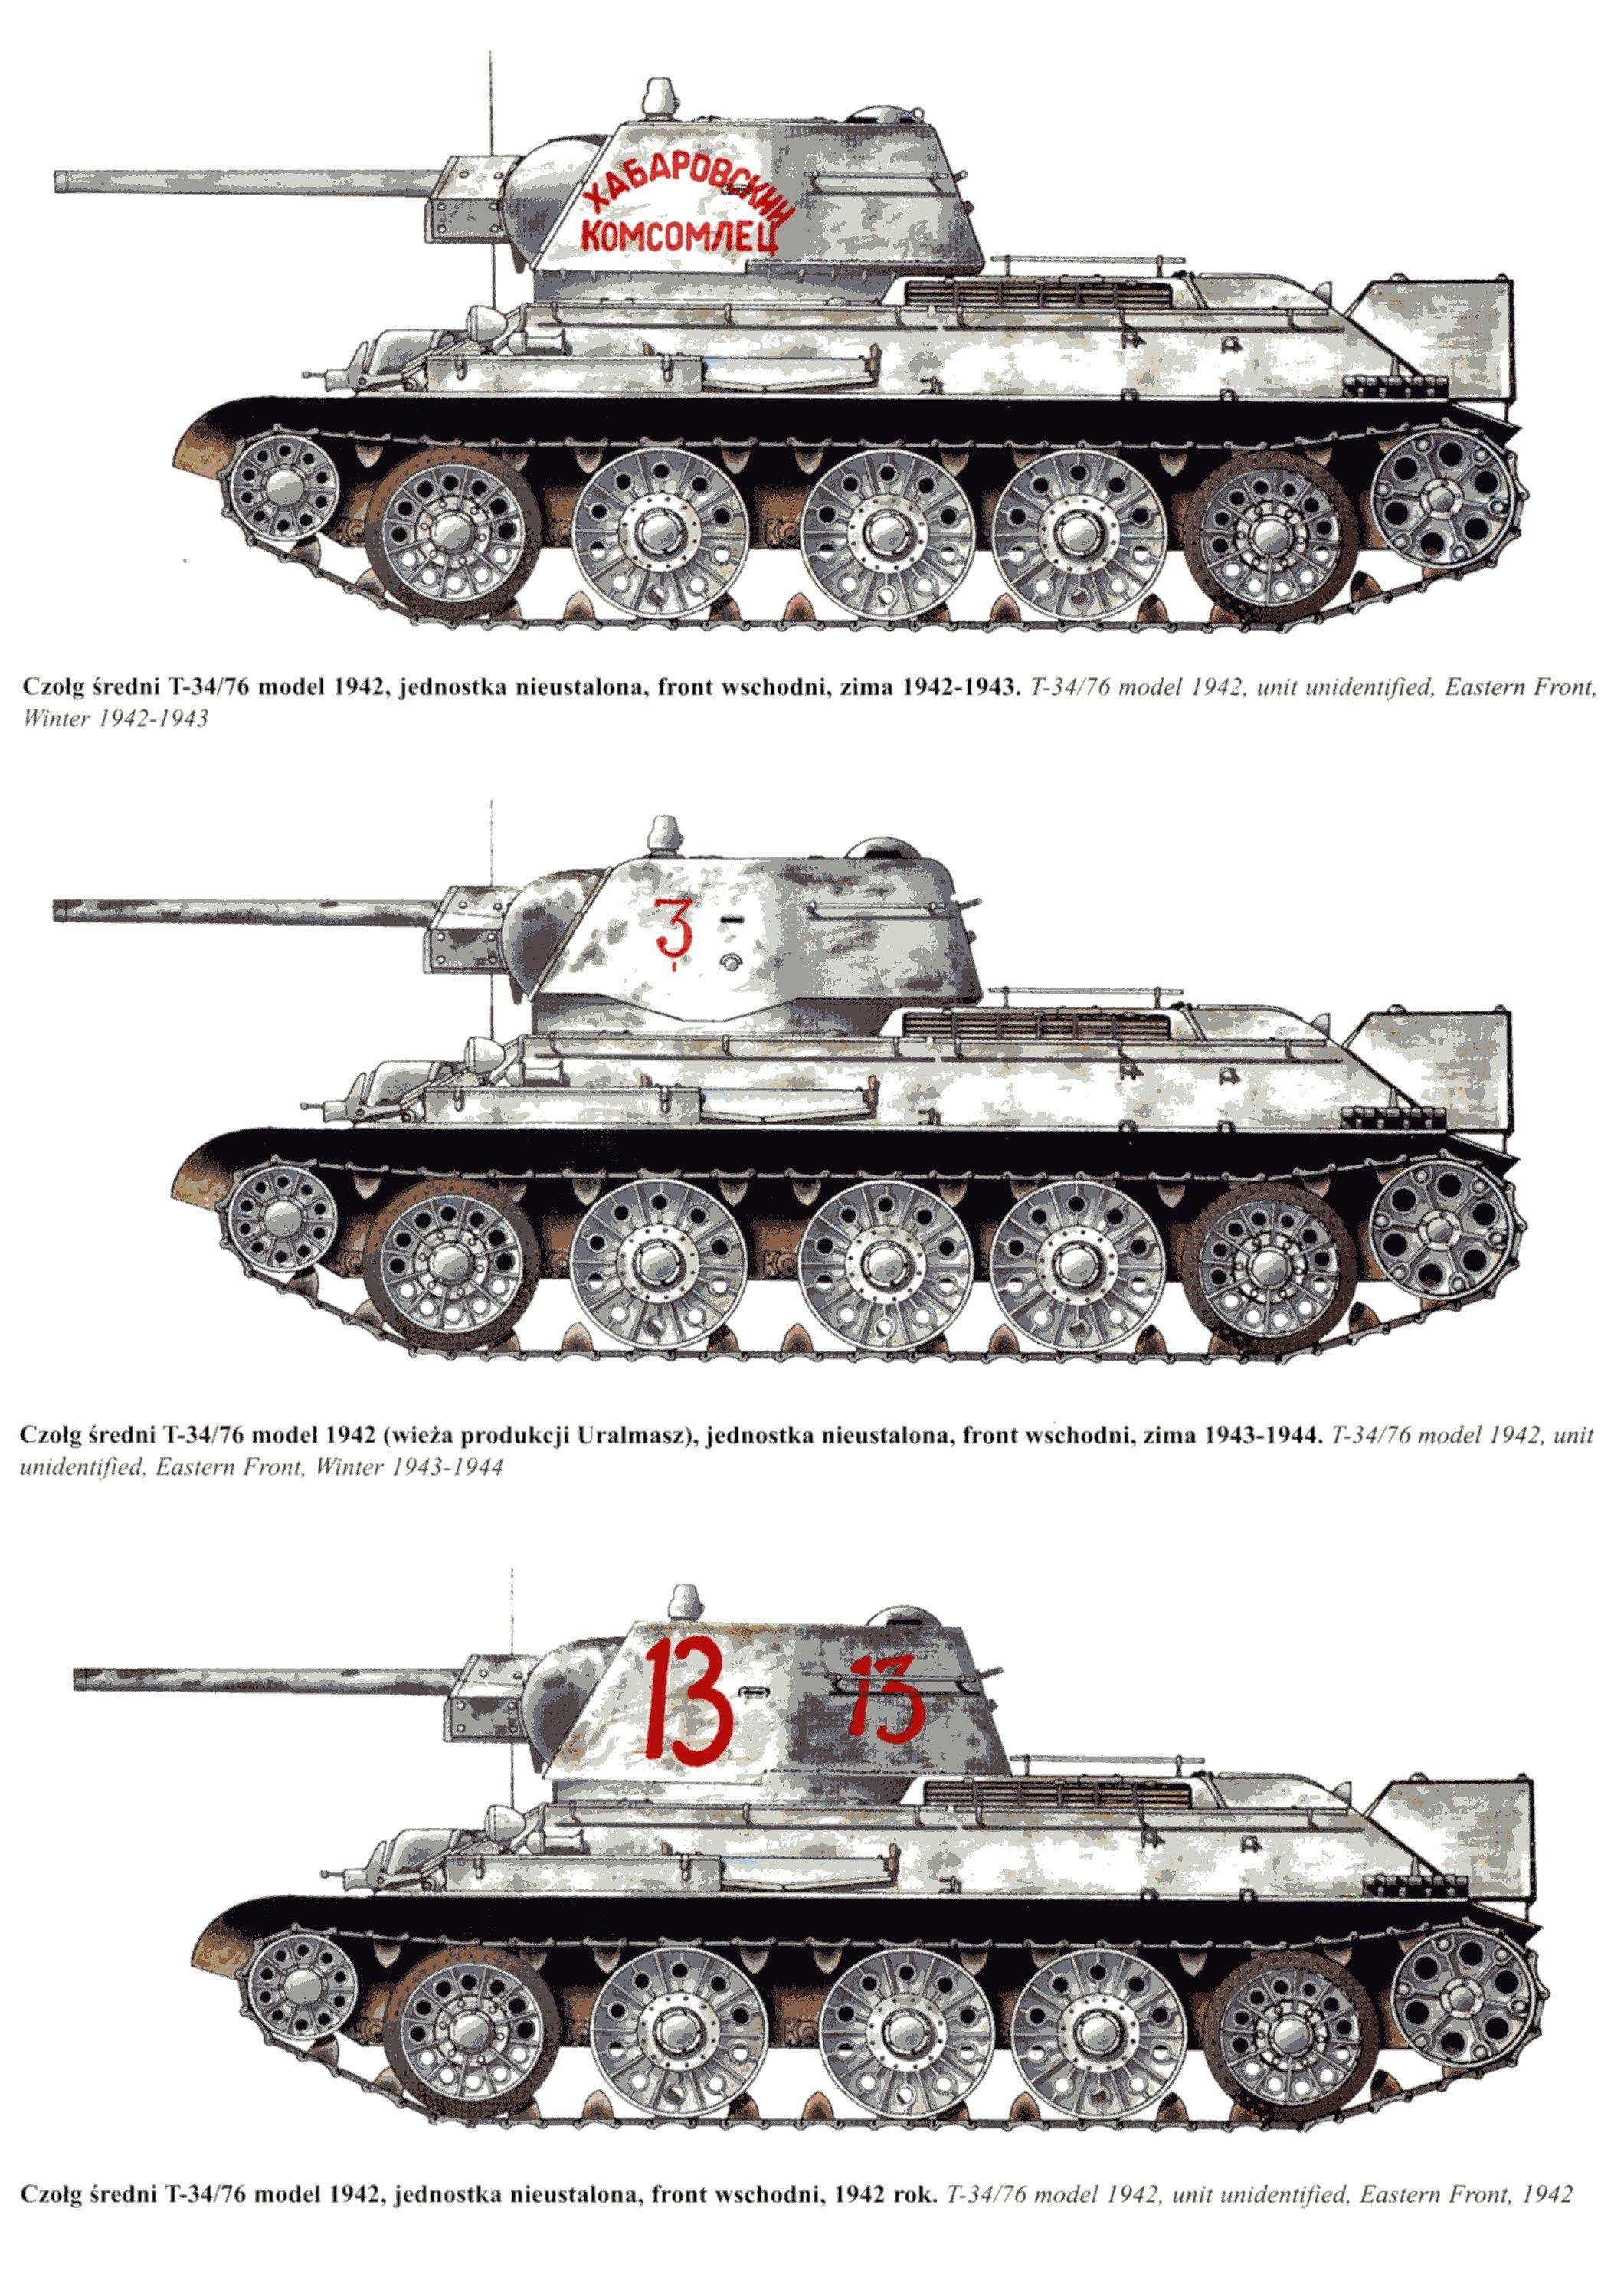 Pin By Michael Wanhella On Tanks